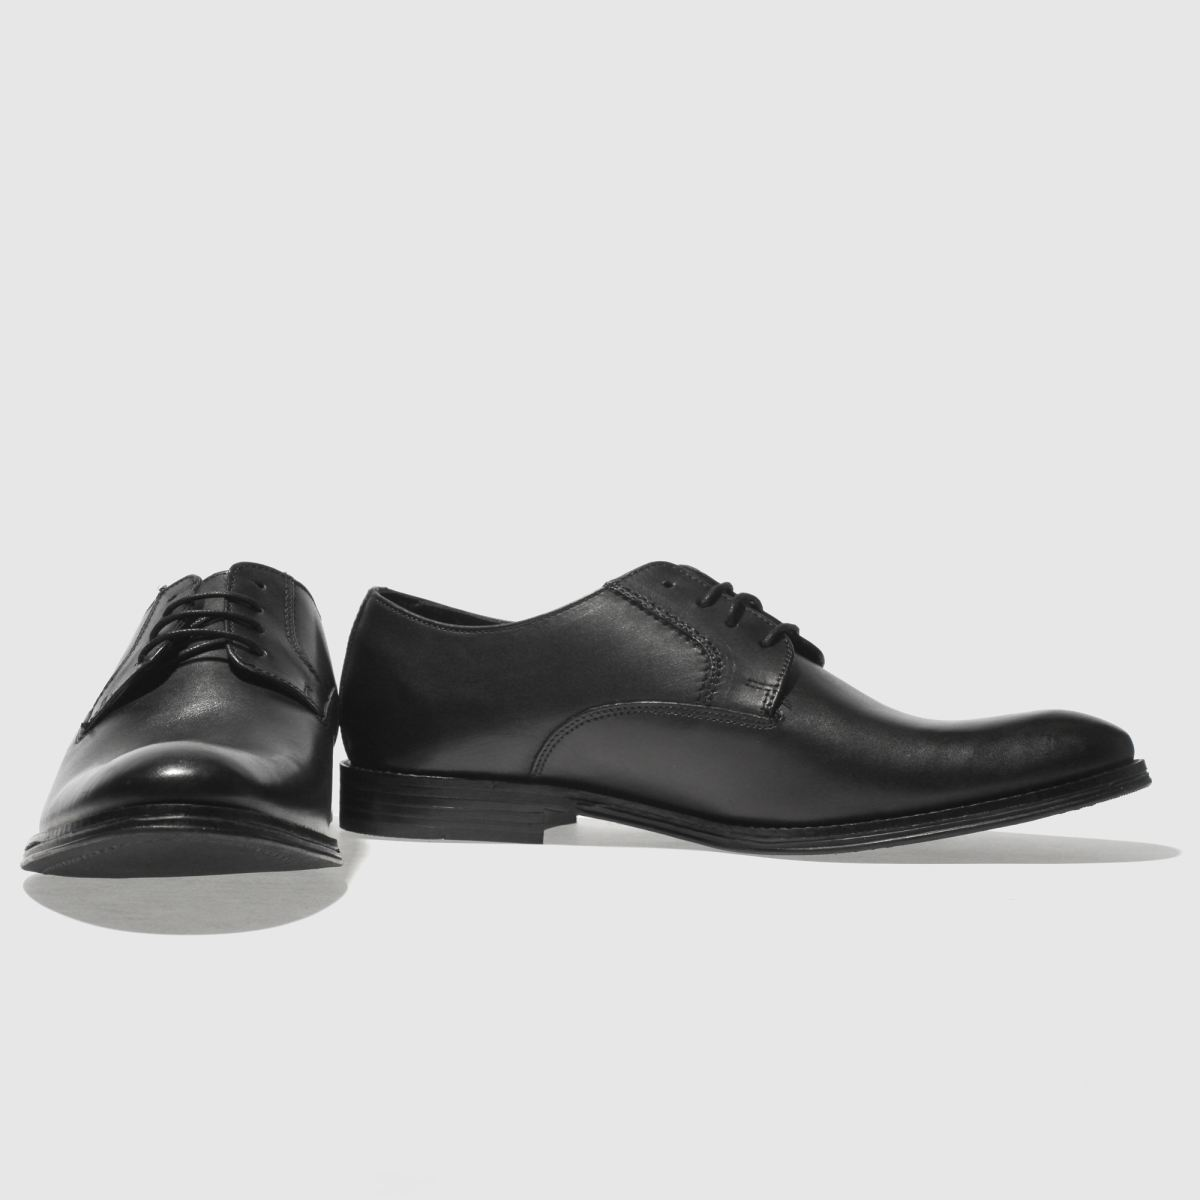 Herren Schwarz ikon Poster Pt Ii Schuhe | schuh Gute Qualität beliebte Schuhe